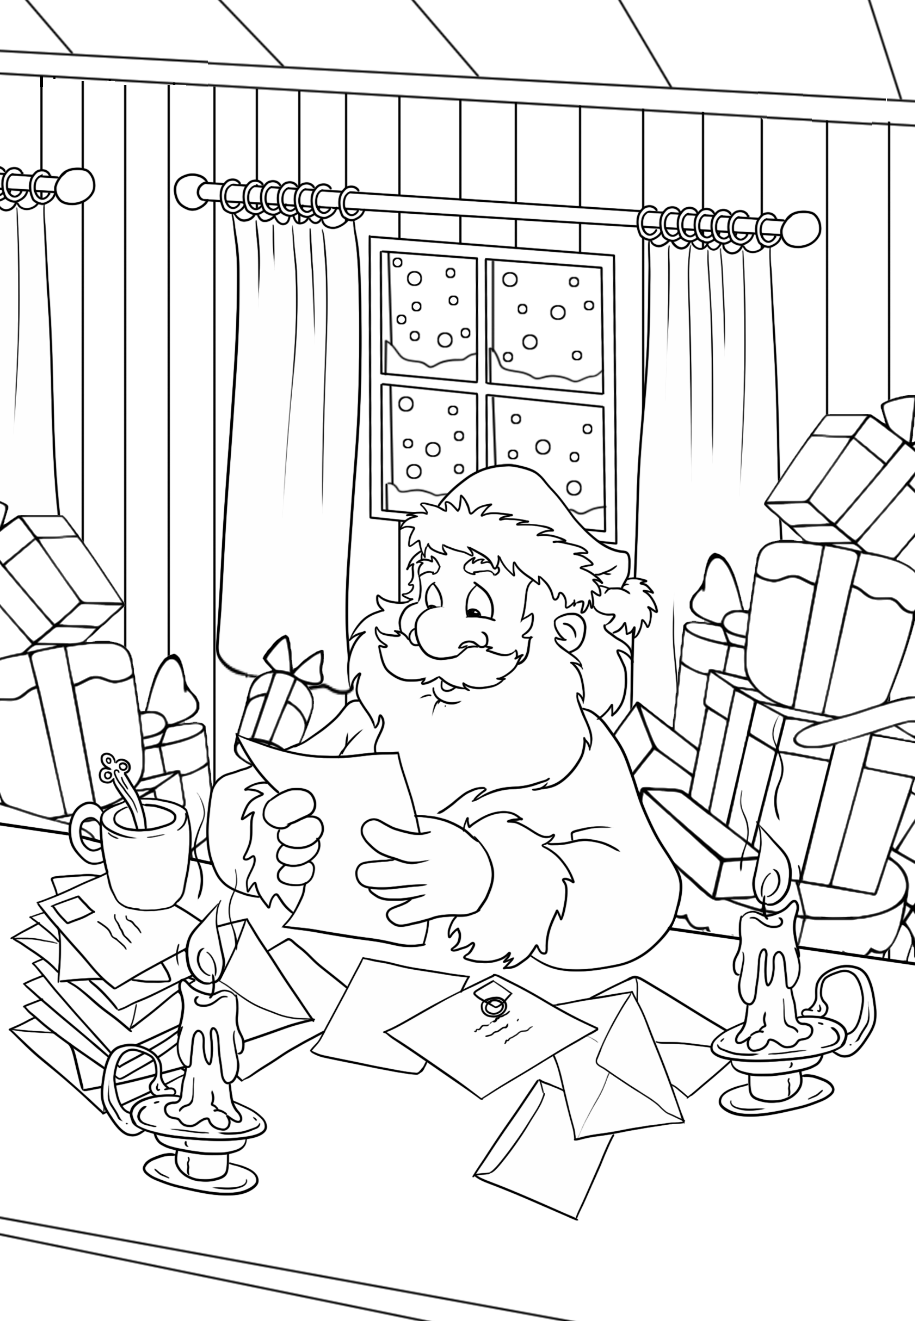 Santa Claus reads letters